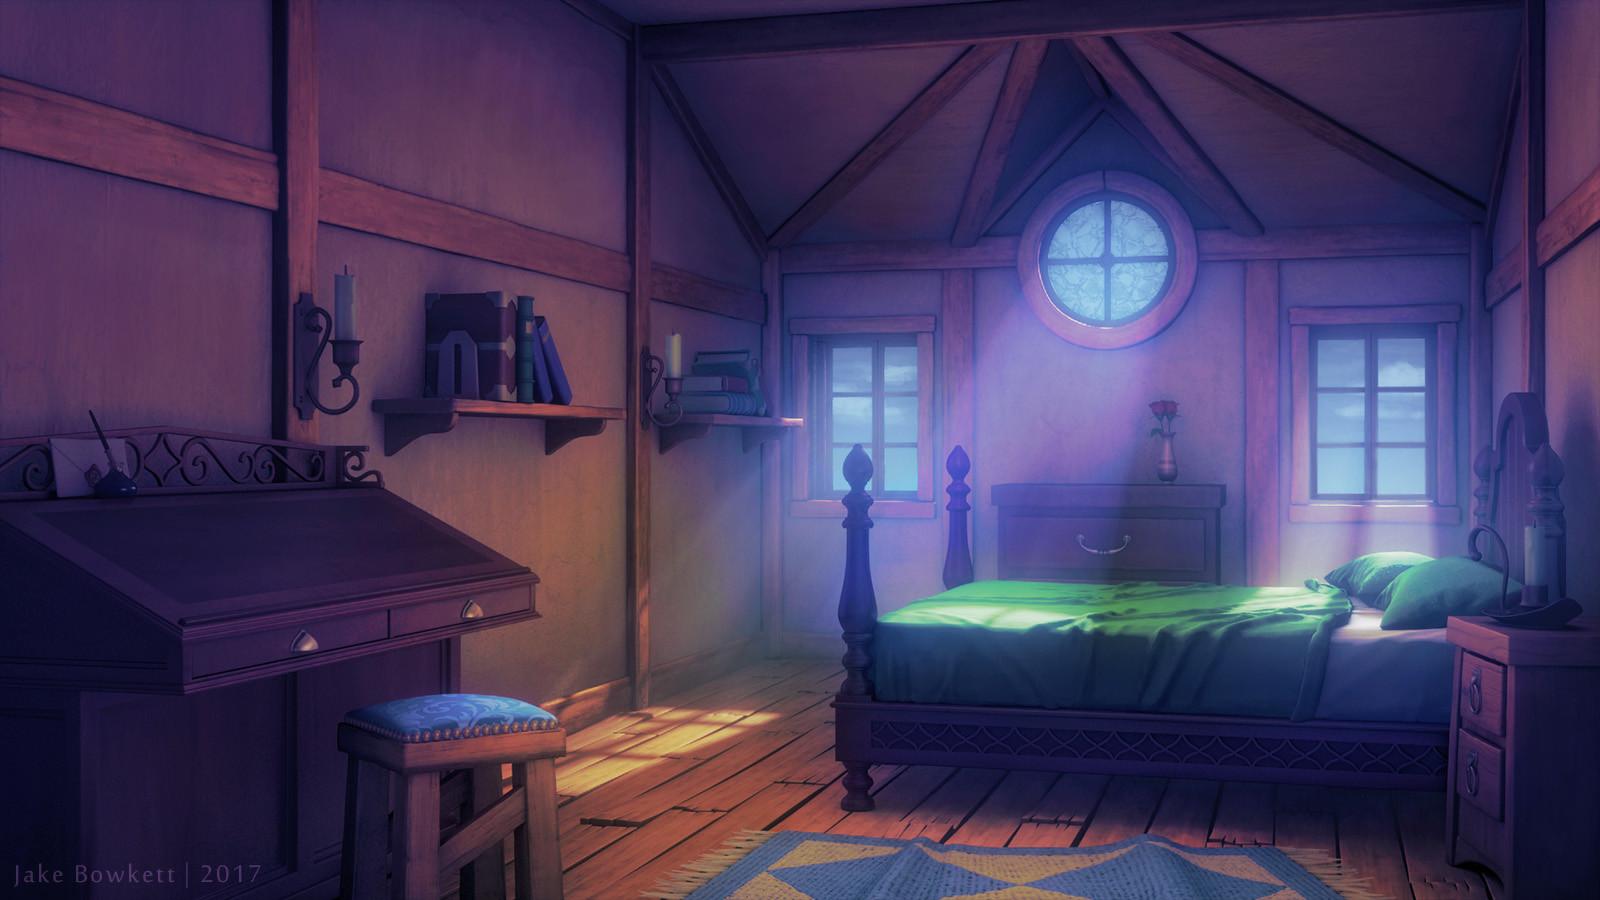 Riromendova usušuova velika kuca  Jake-bowkett-bedroom-morning-by-jake-bowkett